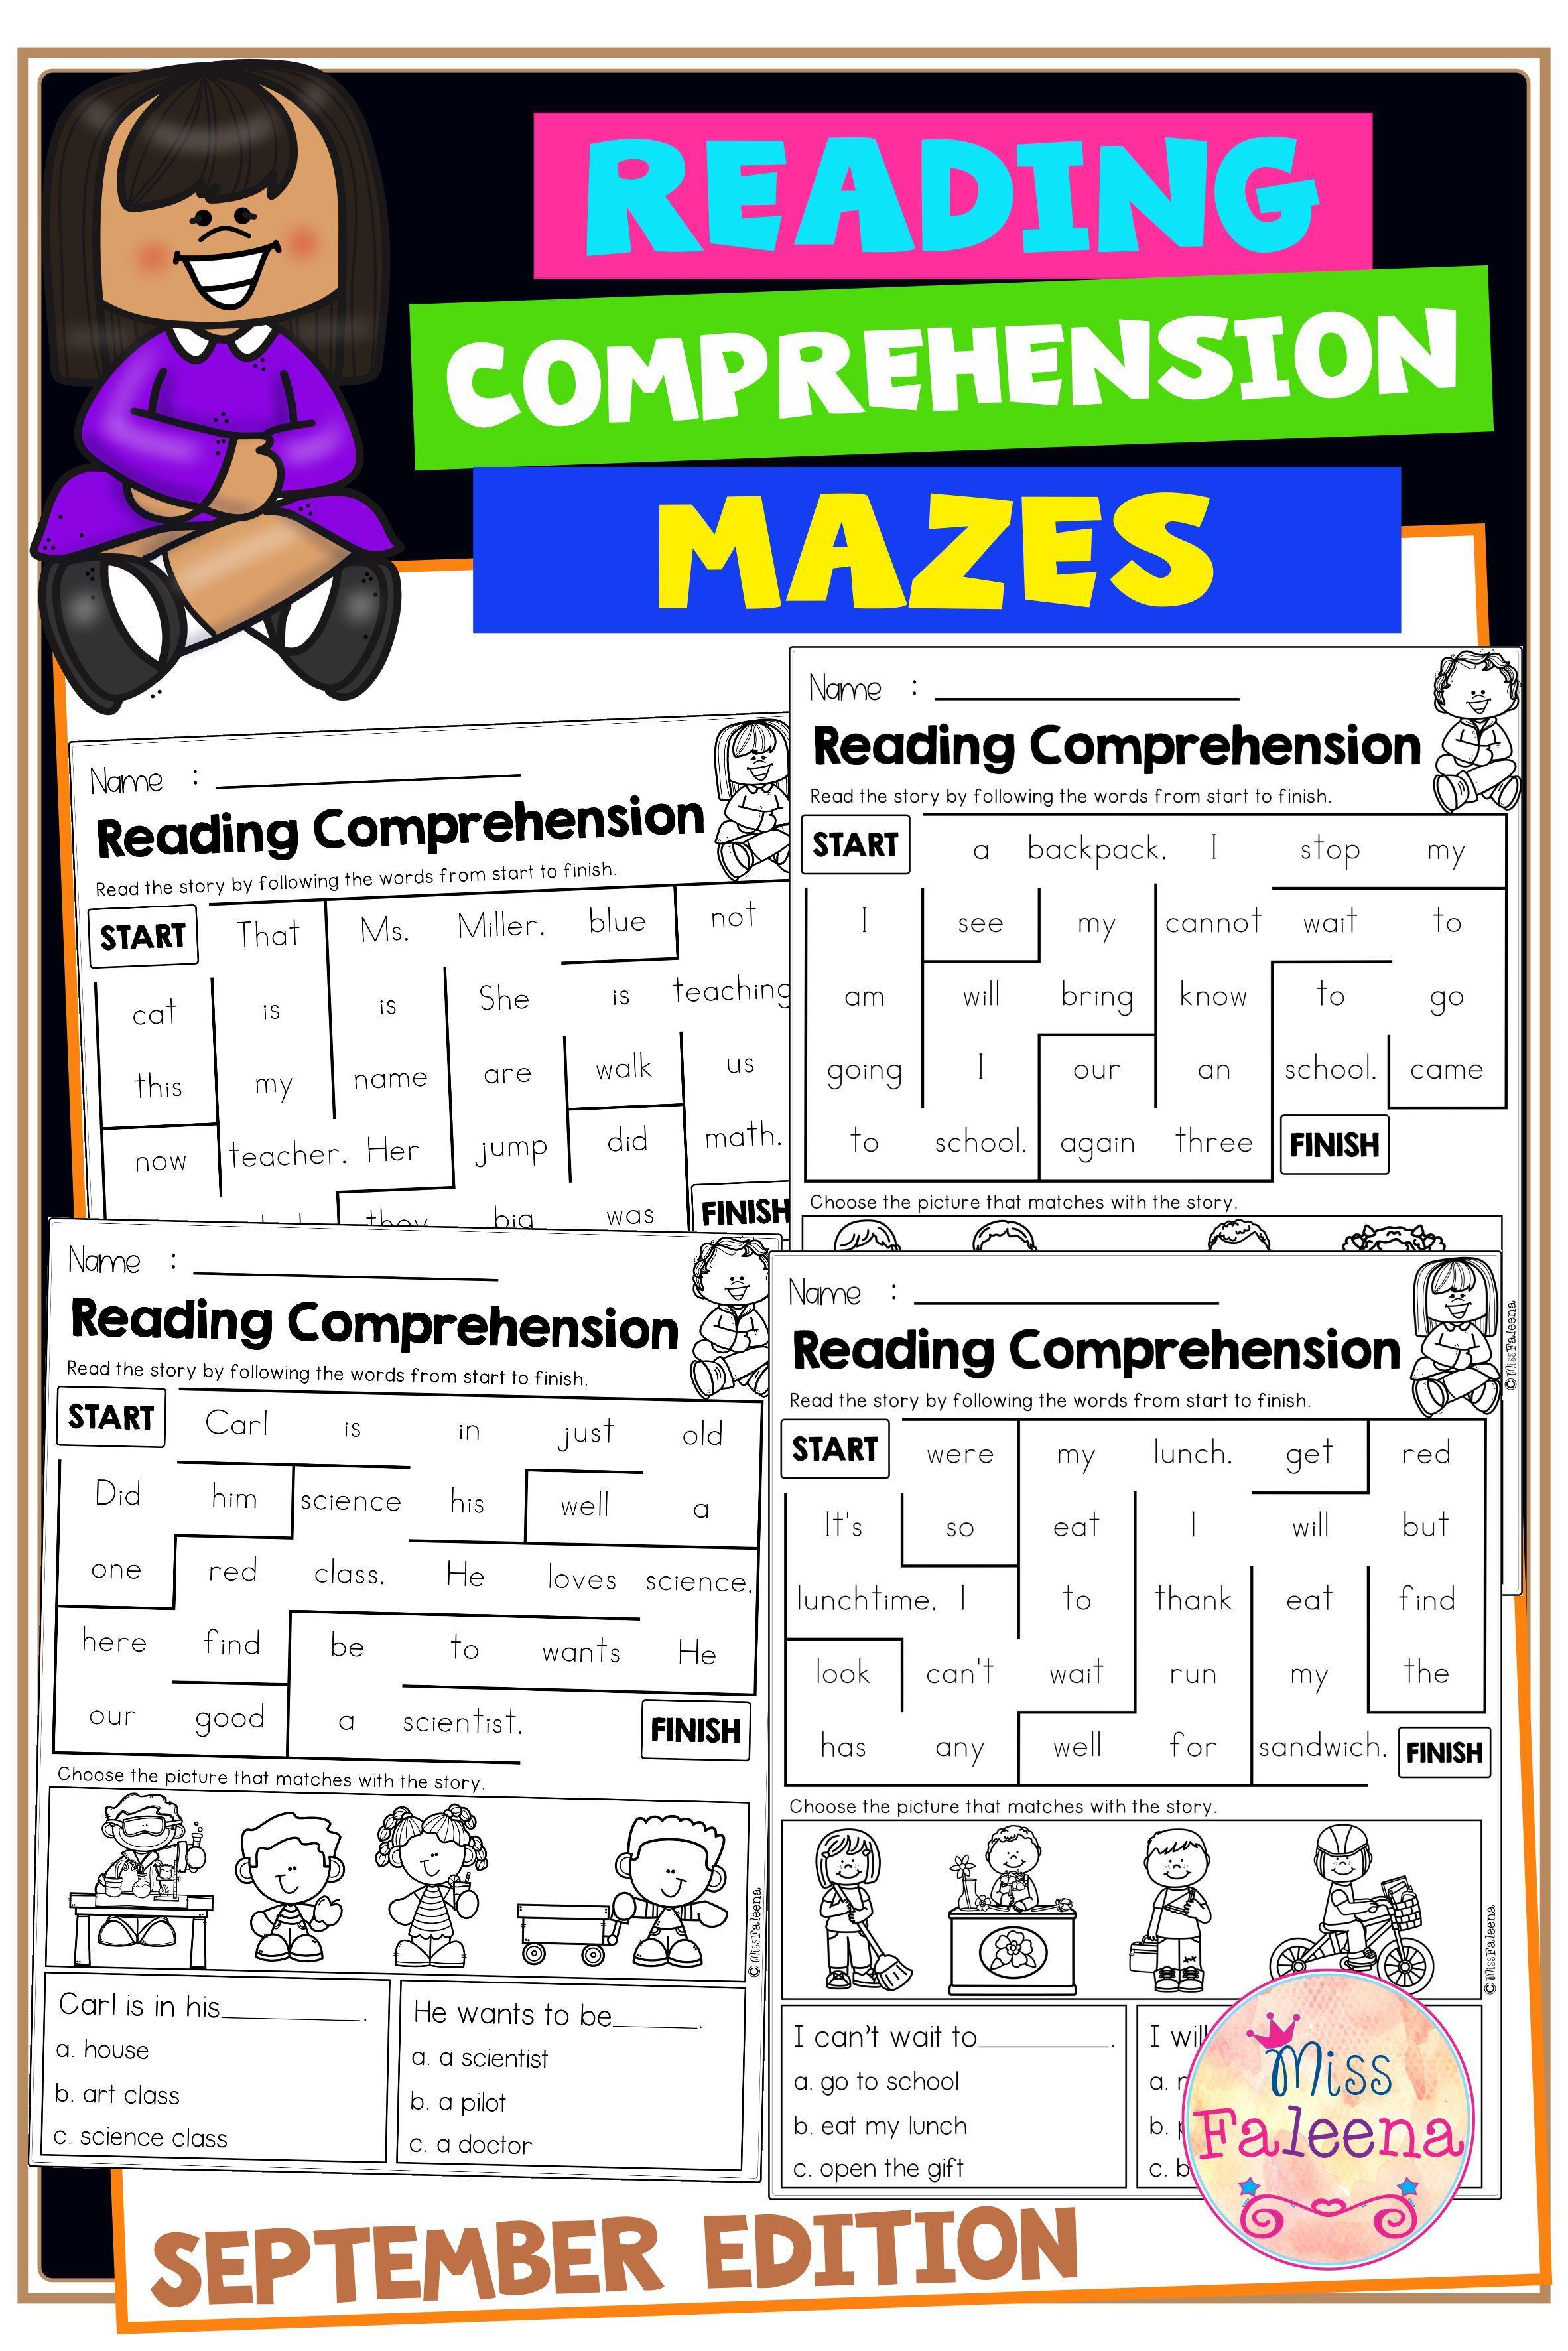 September Reading Comprehension Mazes